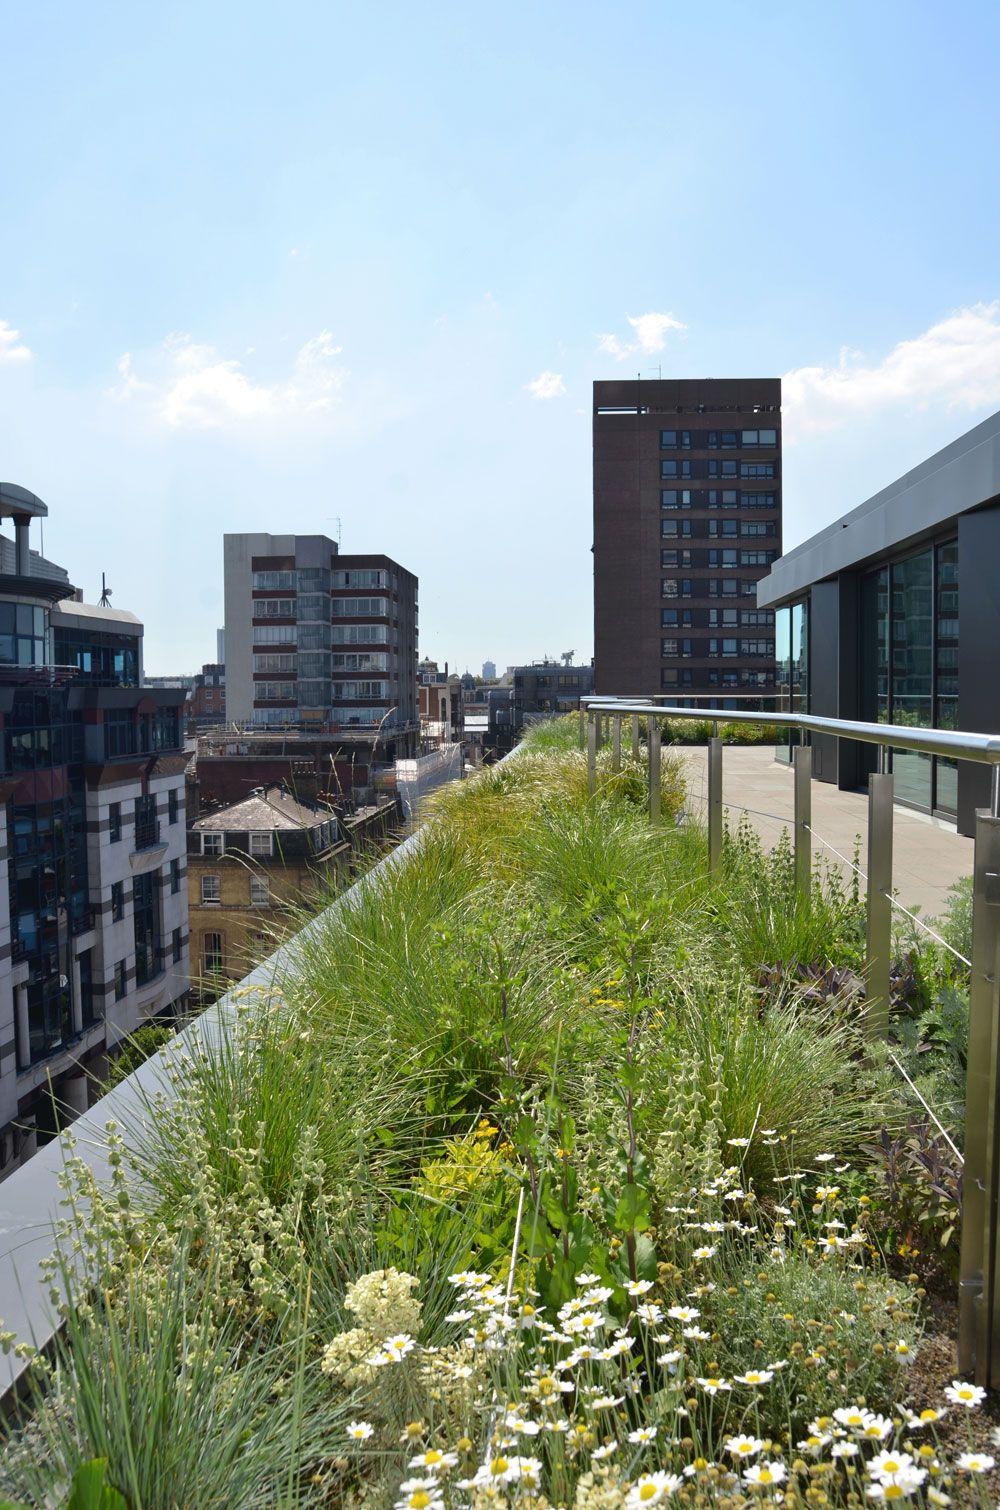 Dsc 0137 Jpg 1000 1510 Green Roof Rooftop Multi Story Building